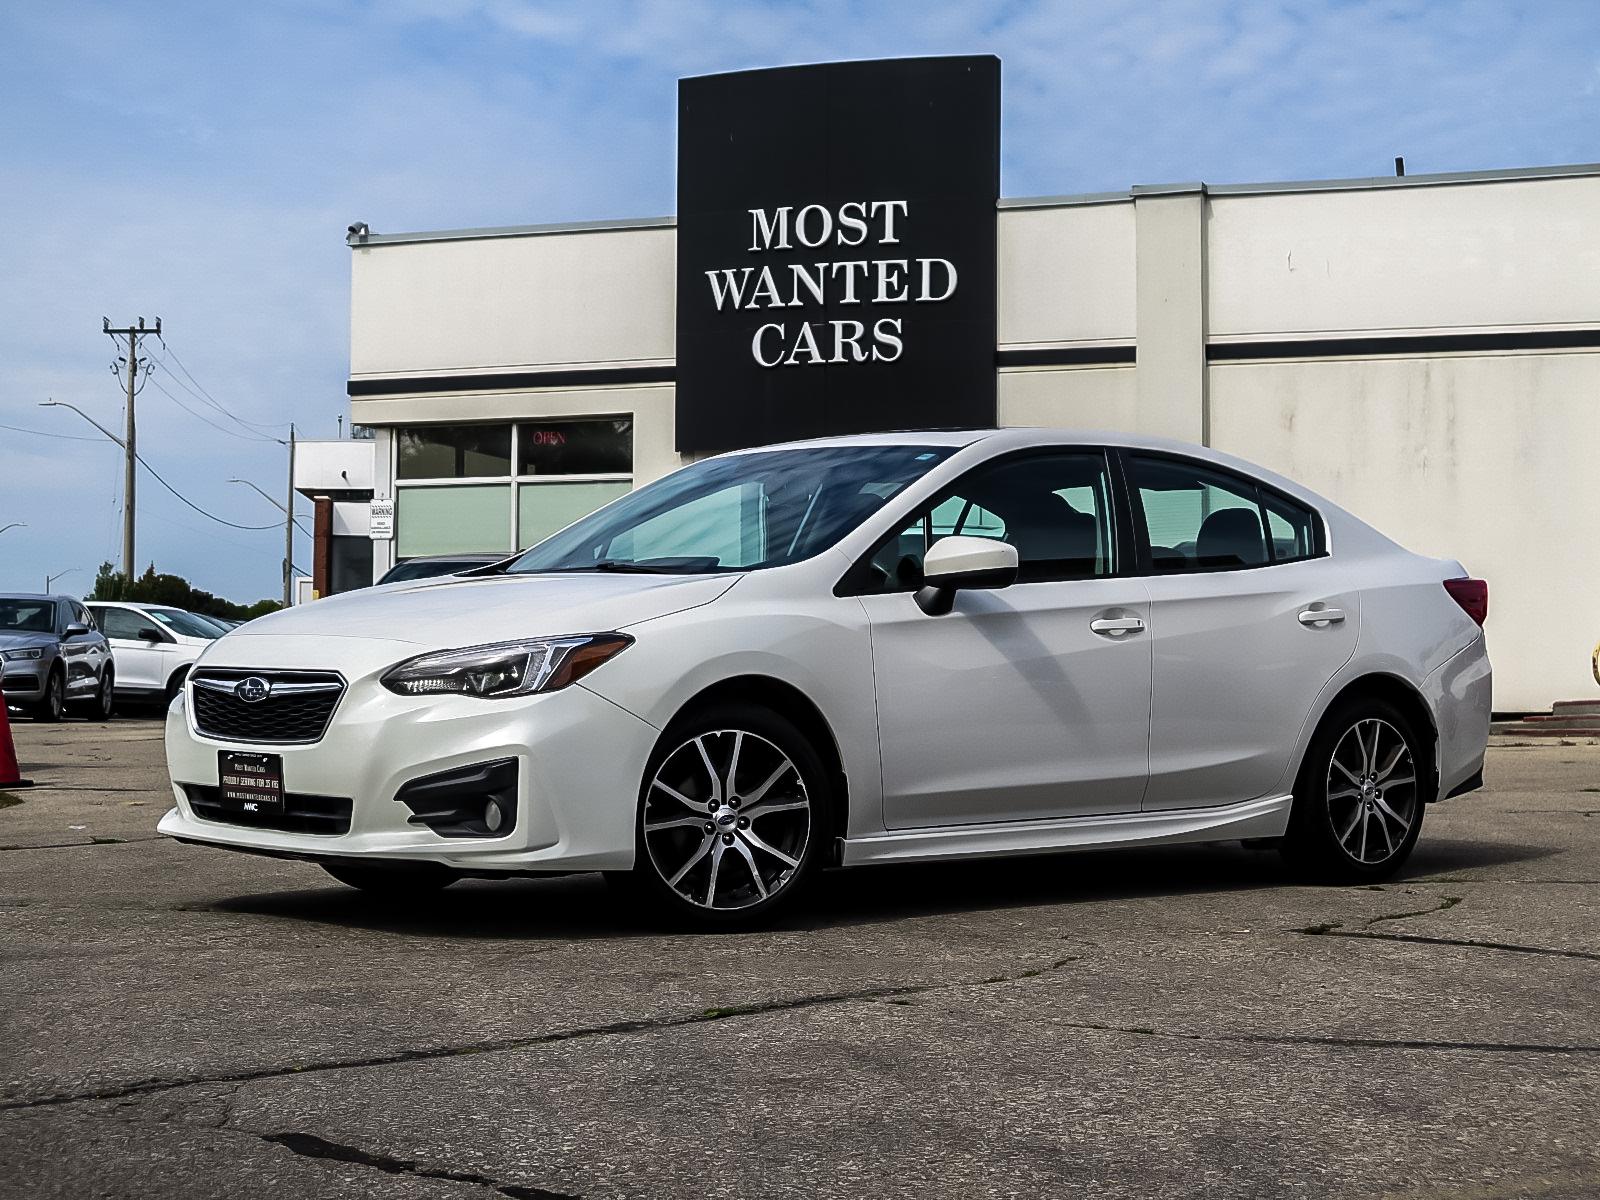 used 2018 Subaru Impreza car, priced at $20,353